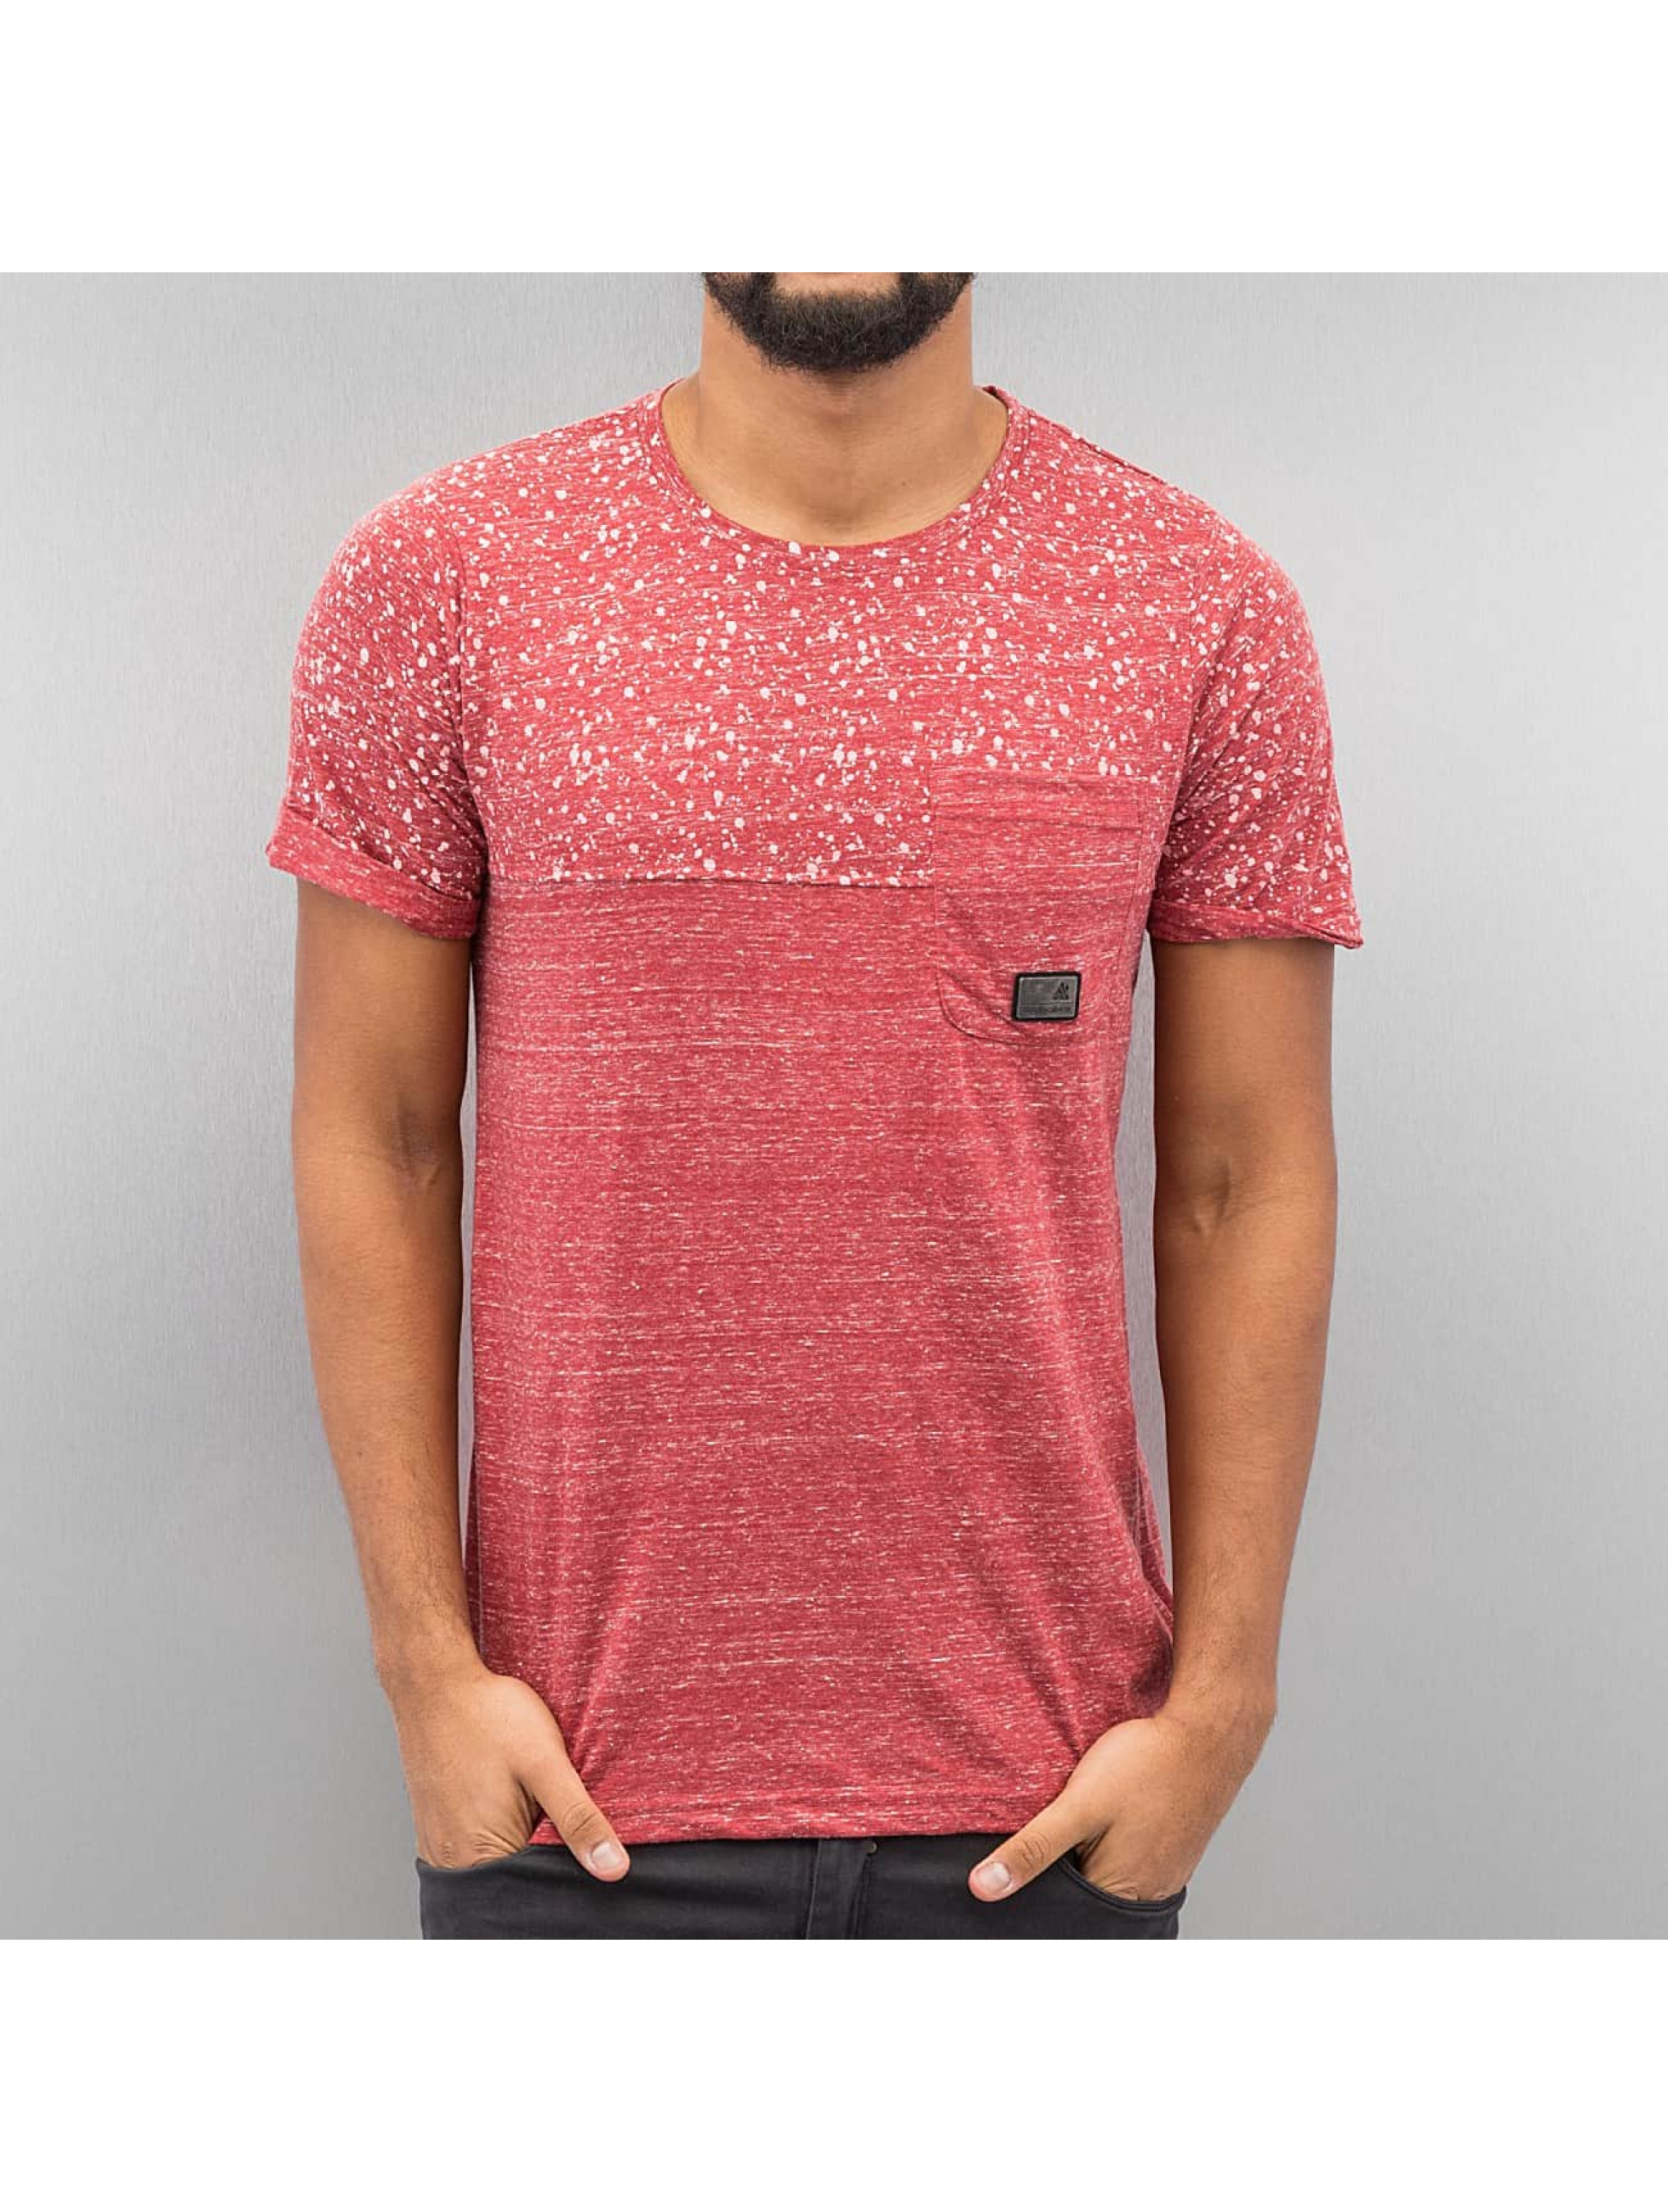 Alife & Kickin t-shirt Vin rood